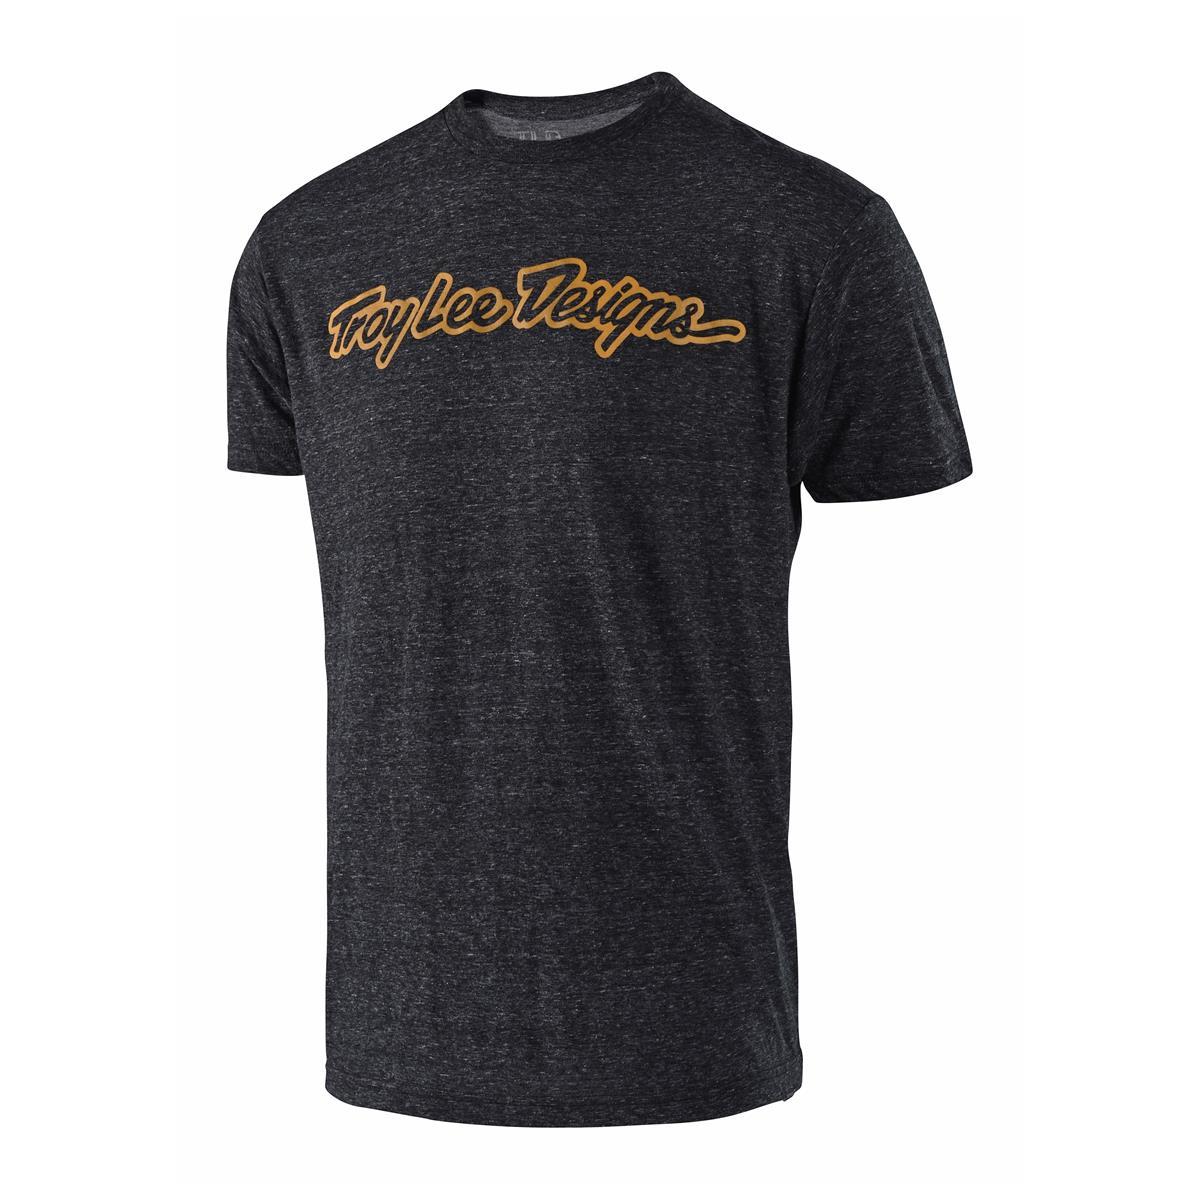 Troy Lee Designs T-Shirt Signature Onyx Snow/Bourbon